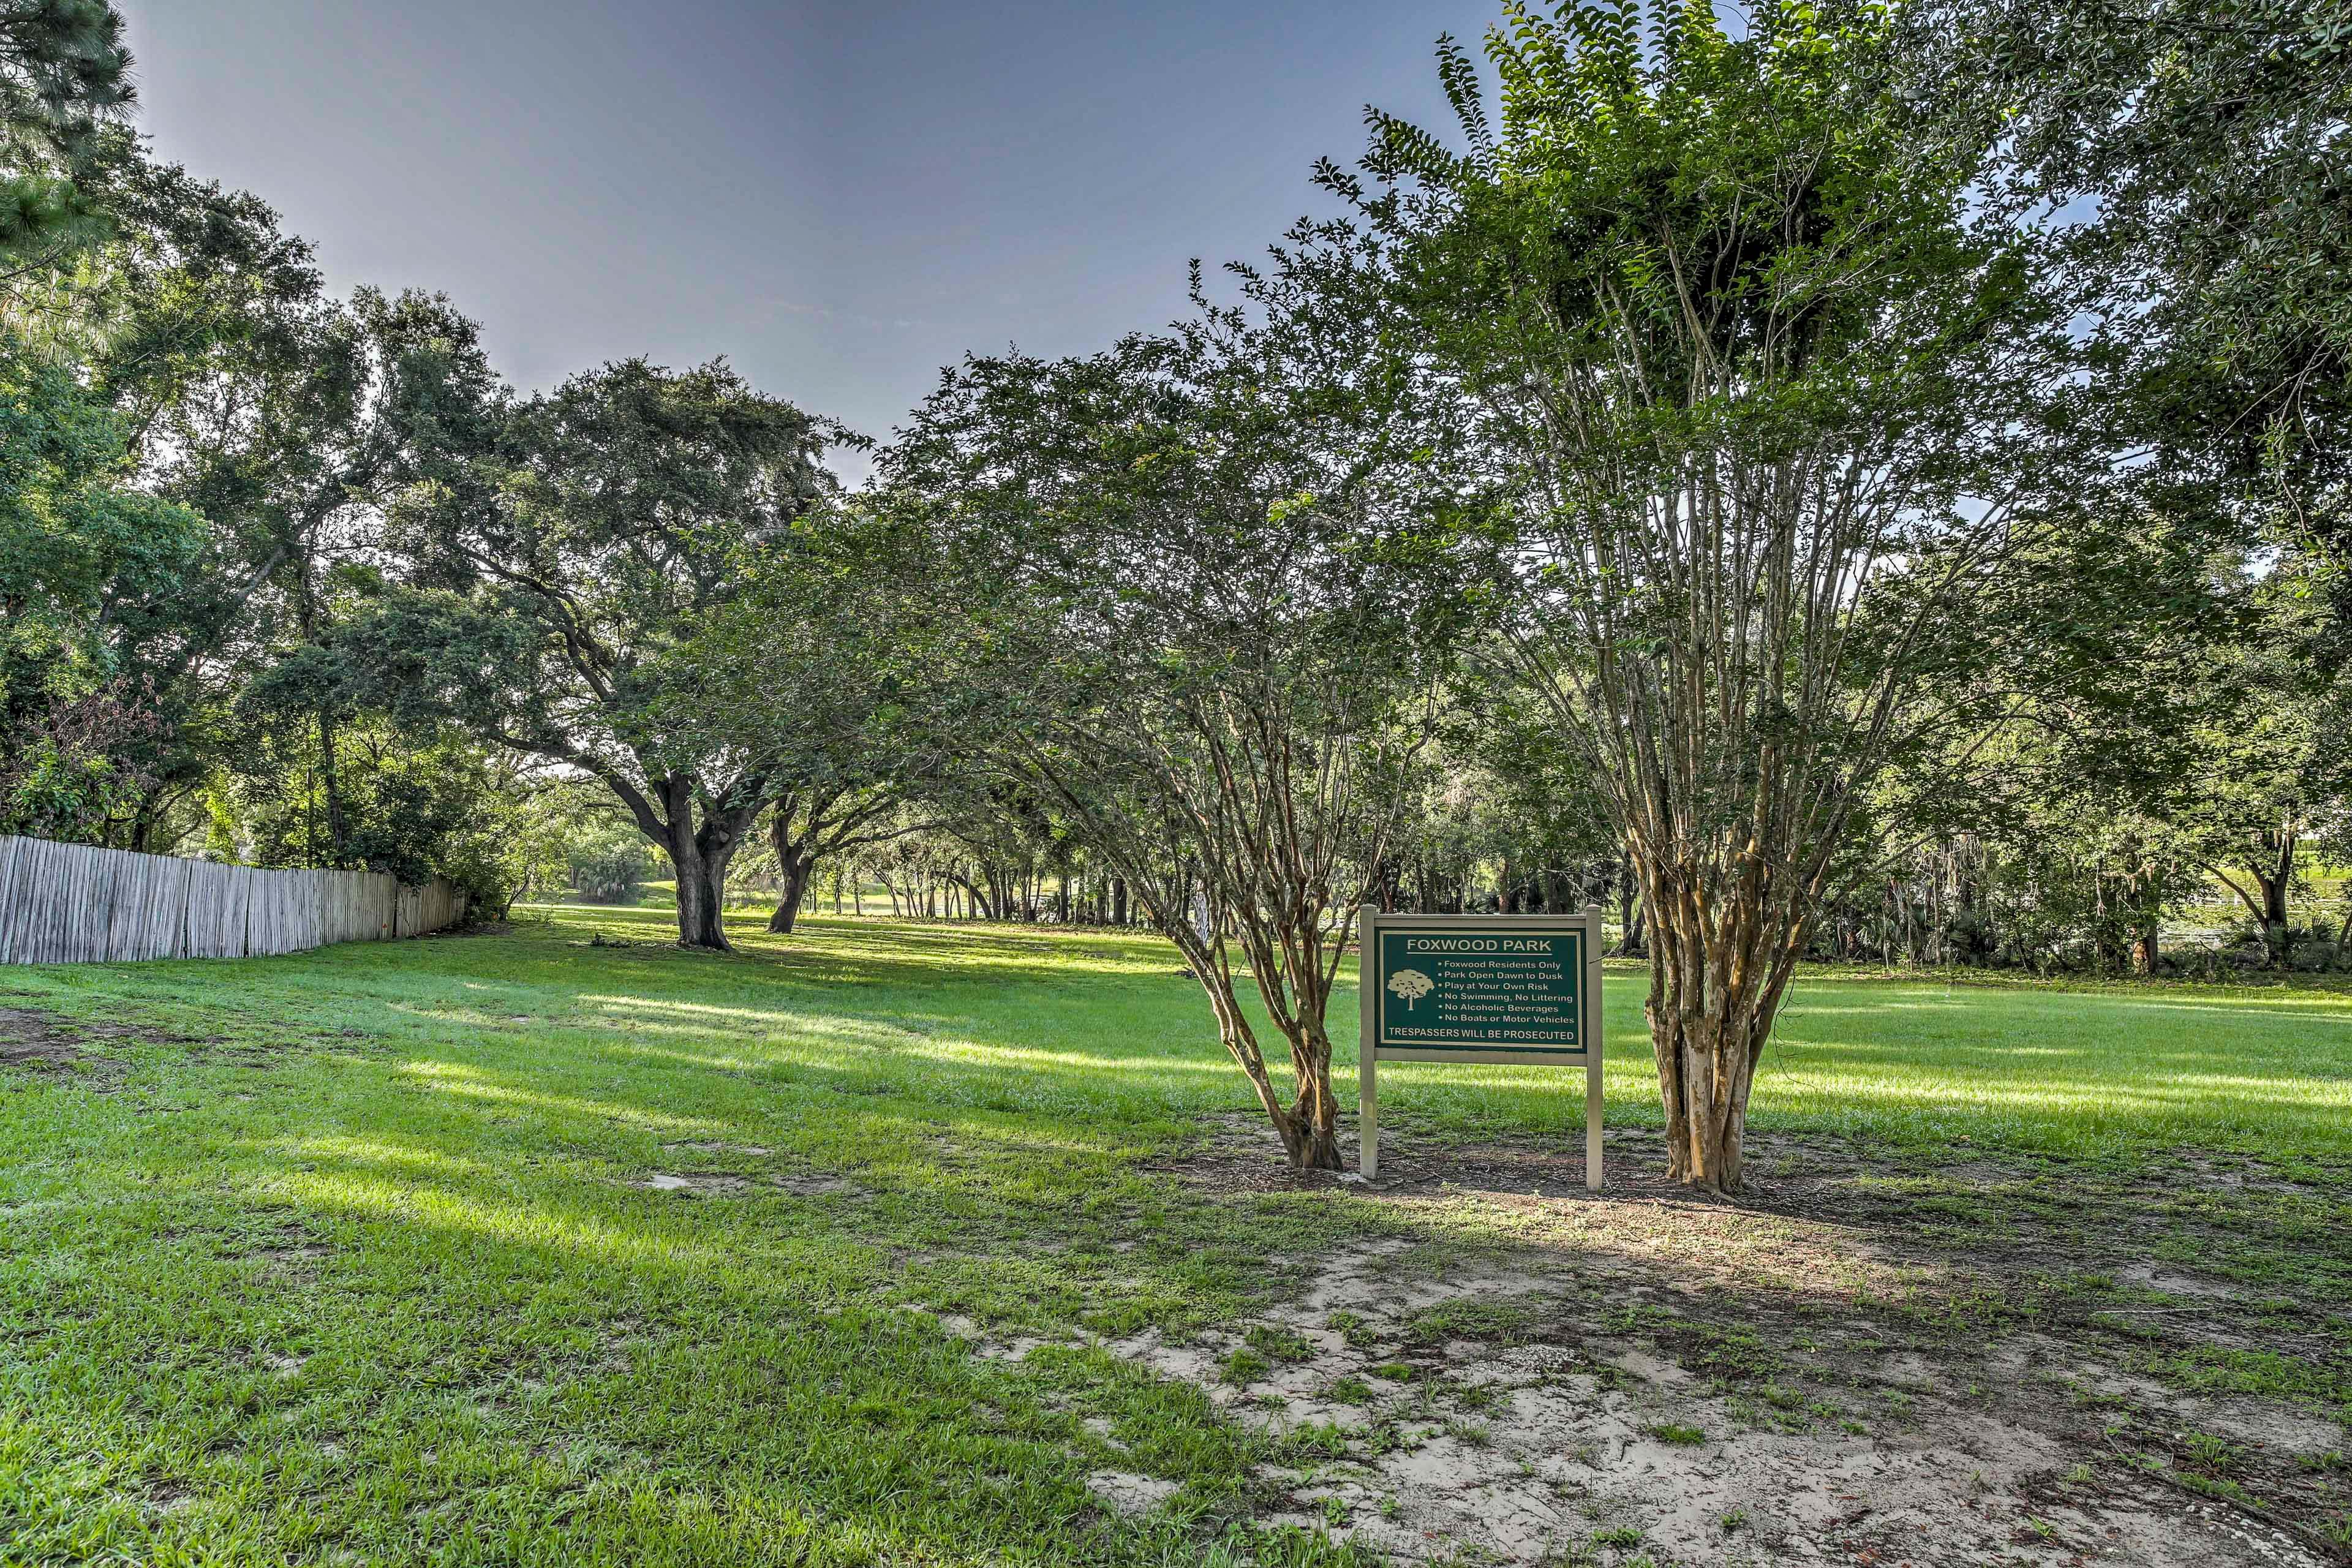 Foxwood Park is right around the corner.